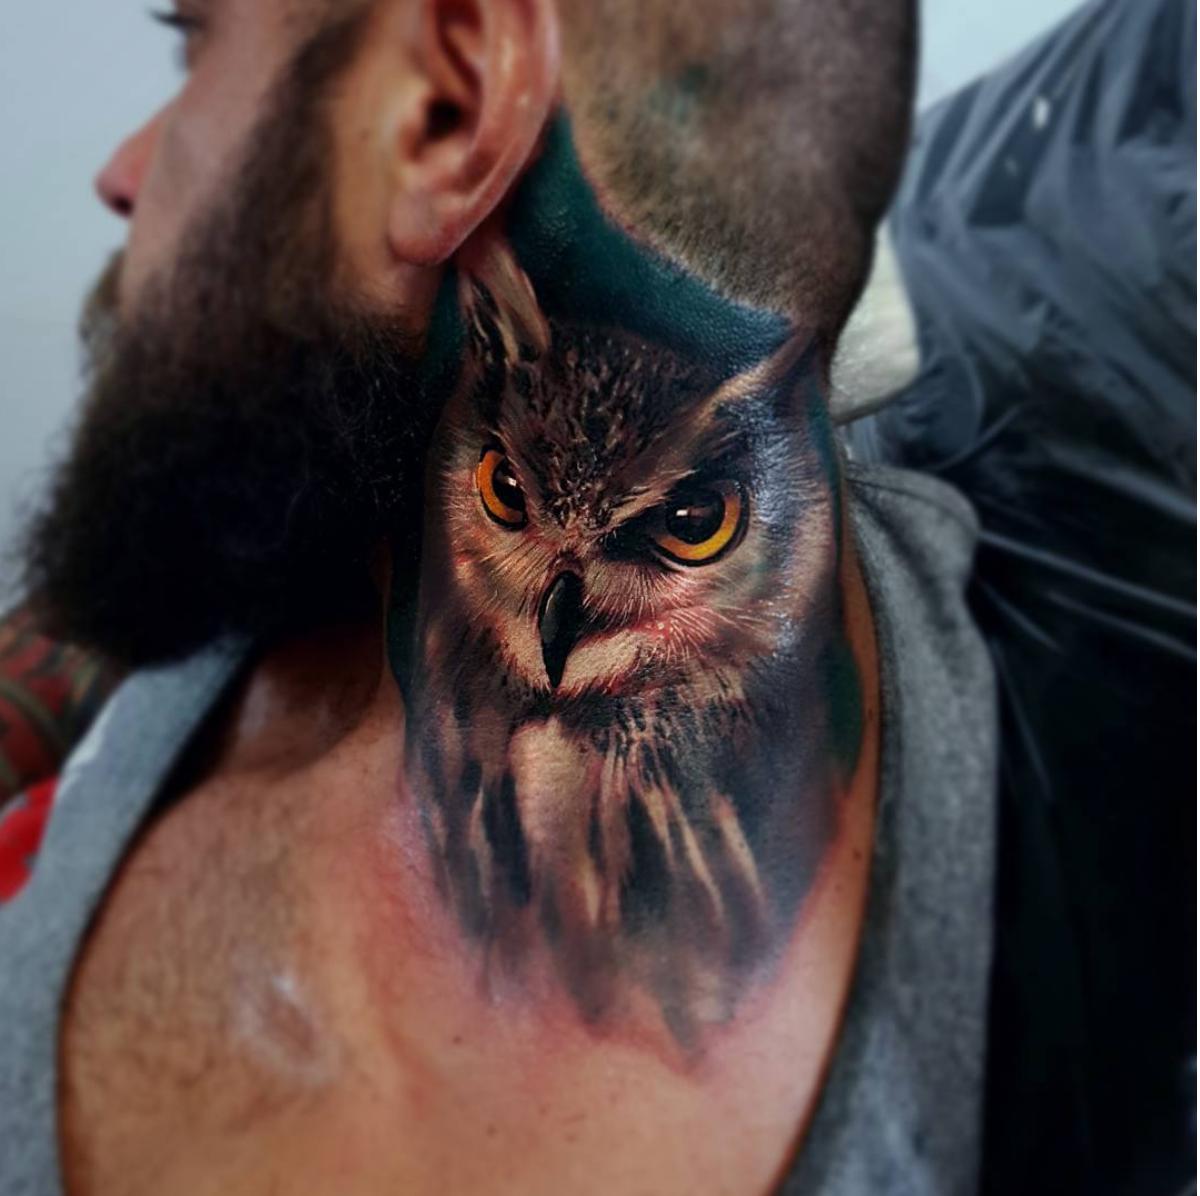 piink-tattoo-piercing-niuniek-tattoostudio-basel-eule-realistic